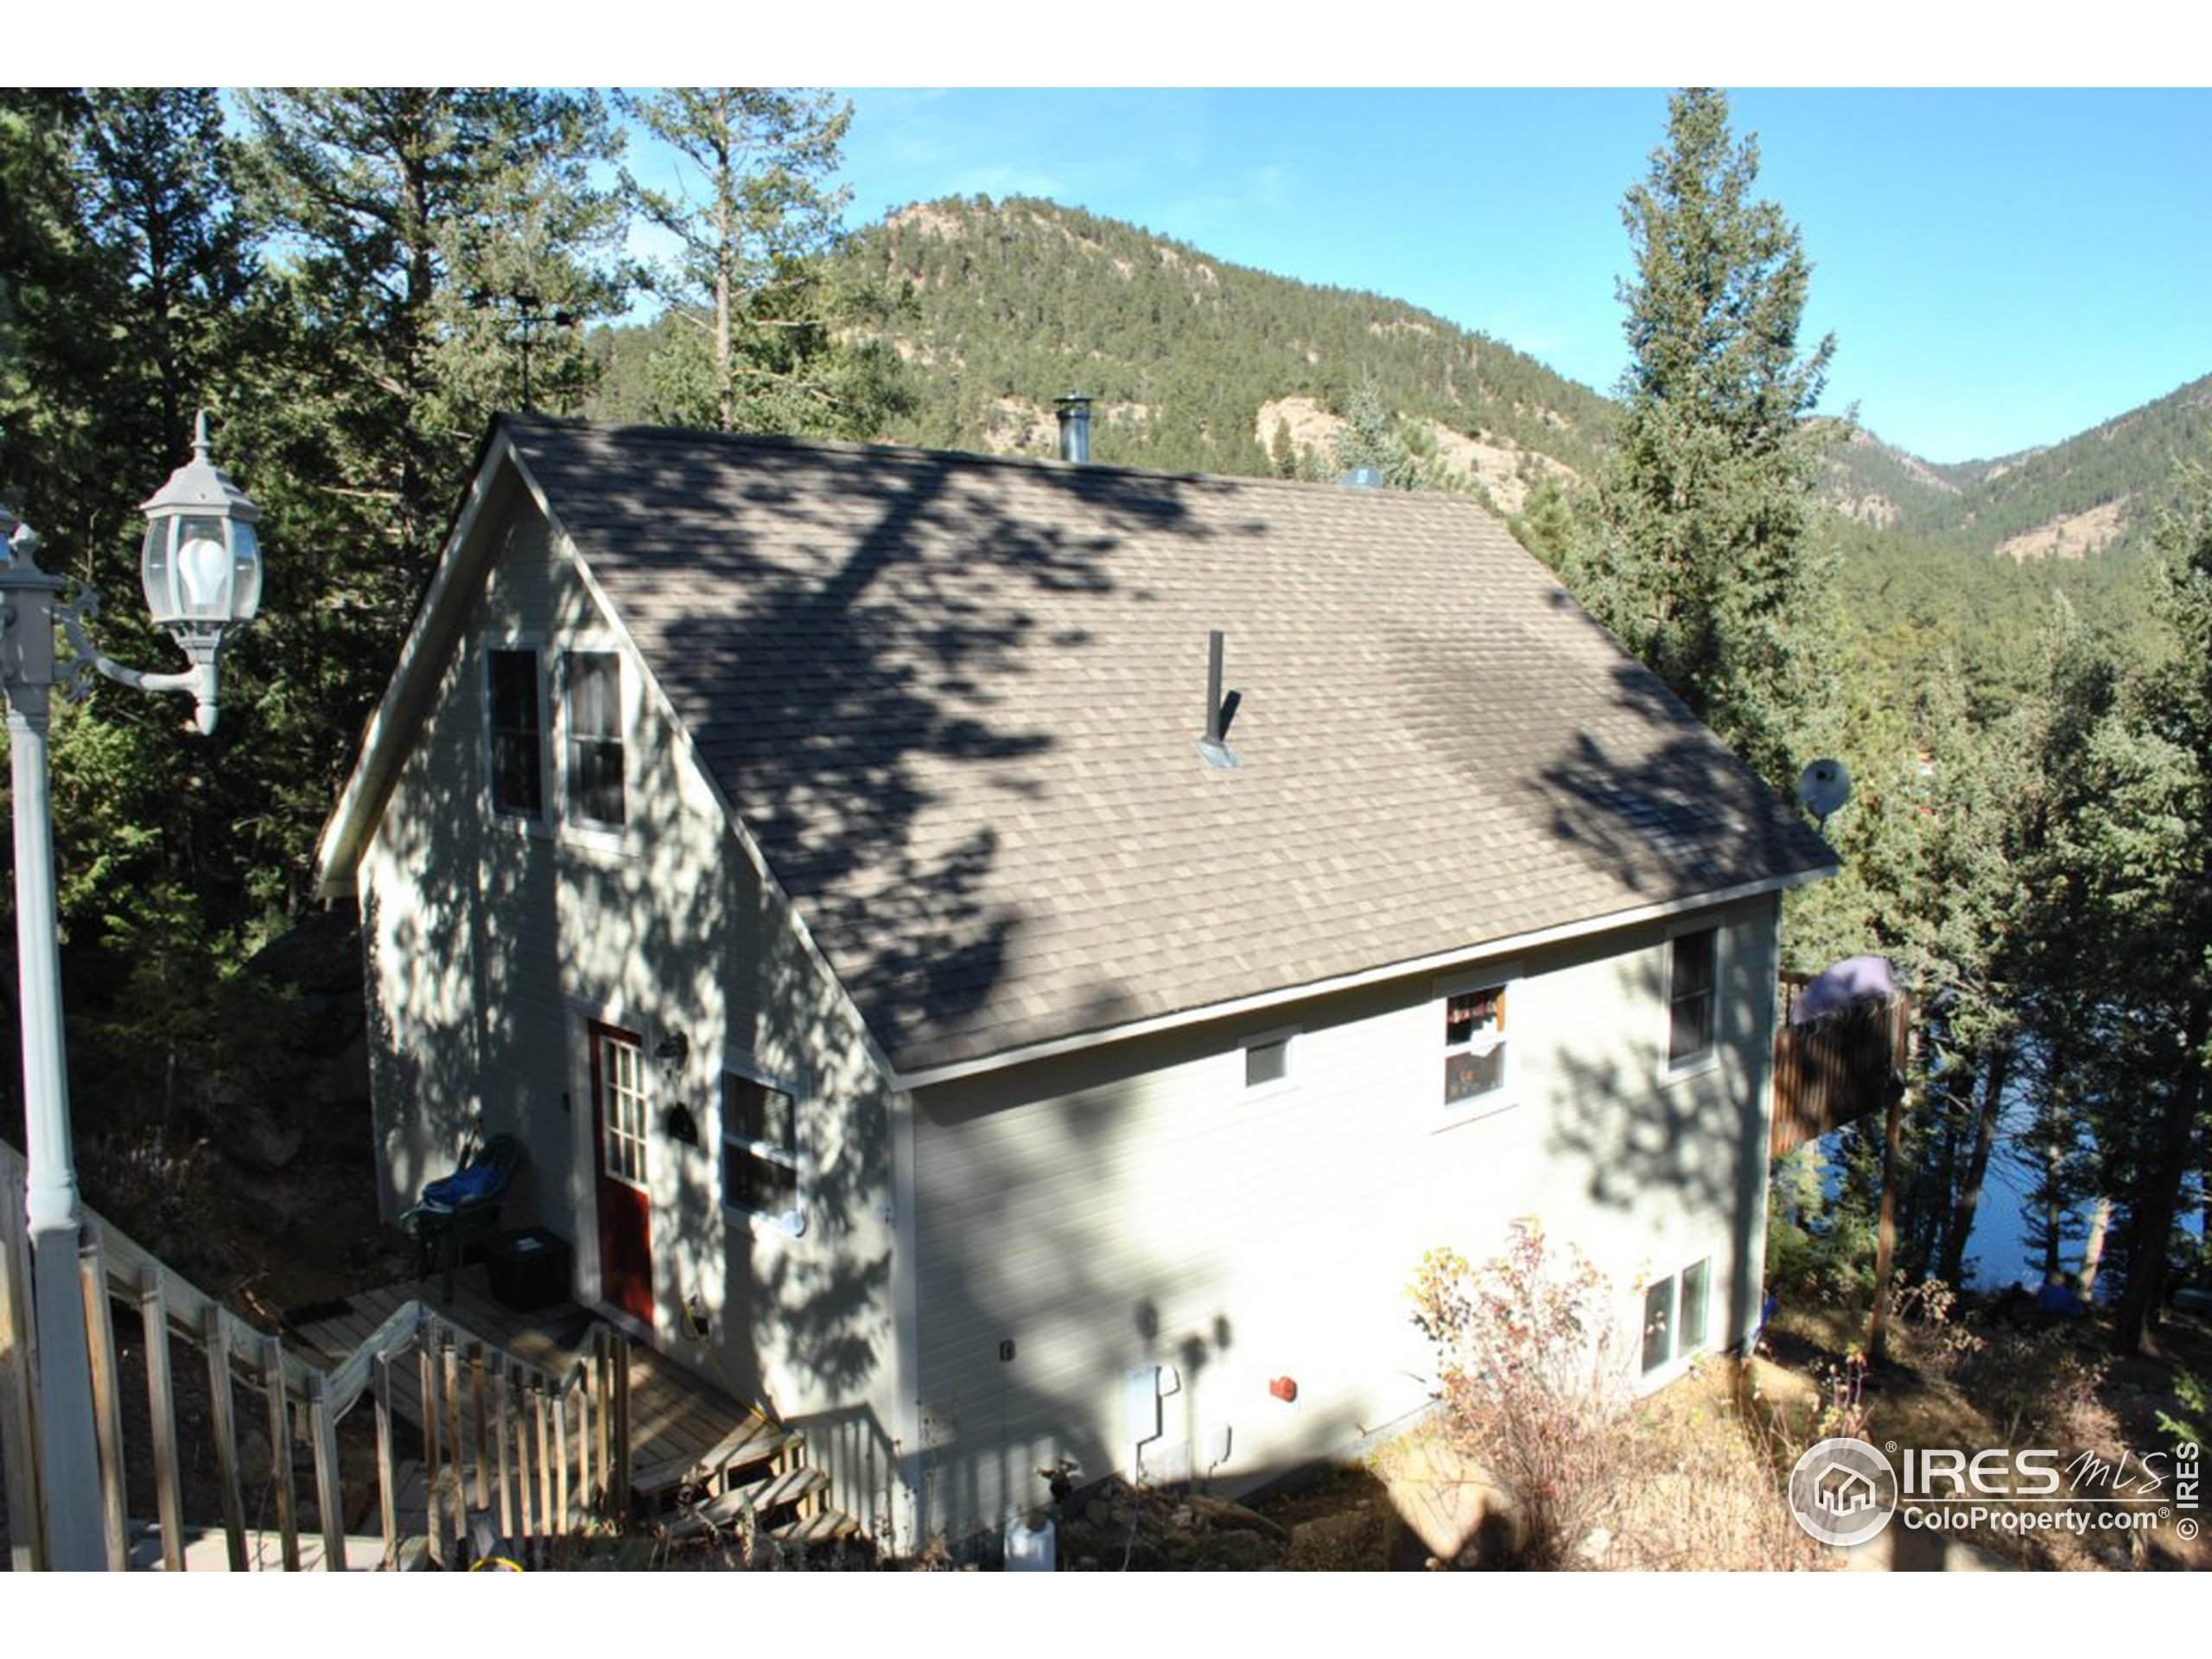 794 Rossum Dr, Loveland, CO 80537 (MLS #942492) :: 8z Real Estate